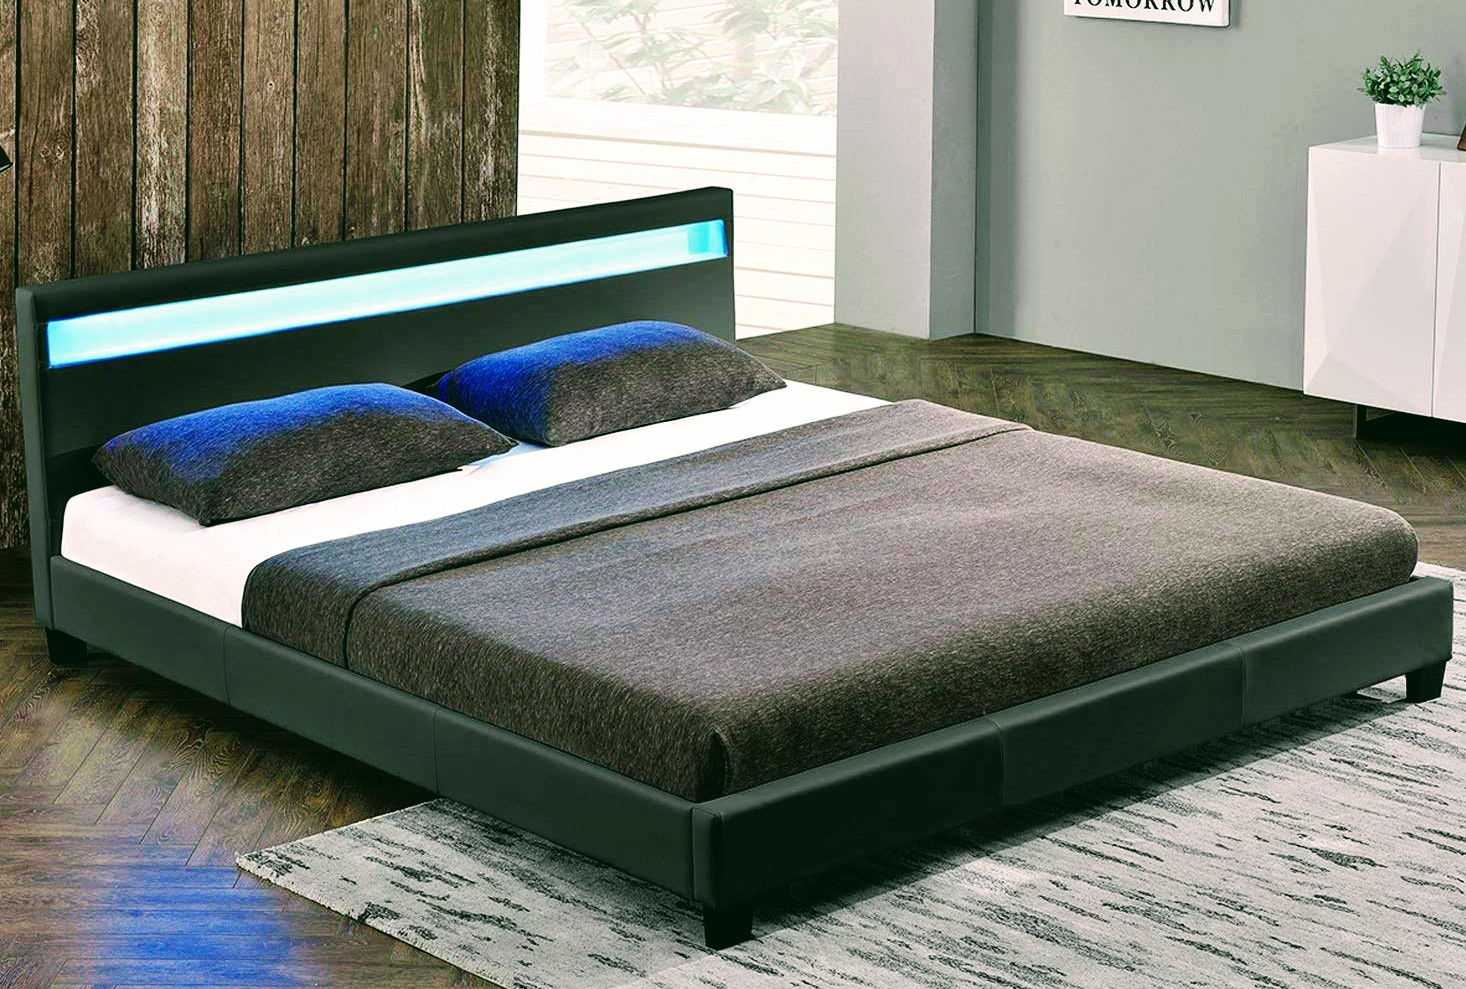 Bett 140x200 Online Günstige Betten Länge 140 Cm Mal